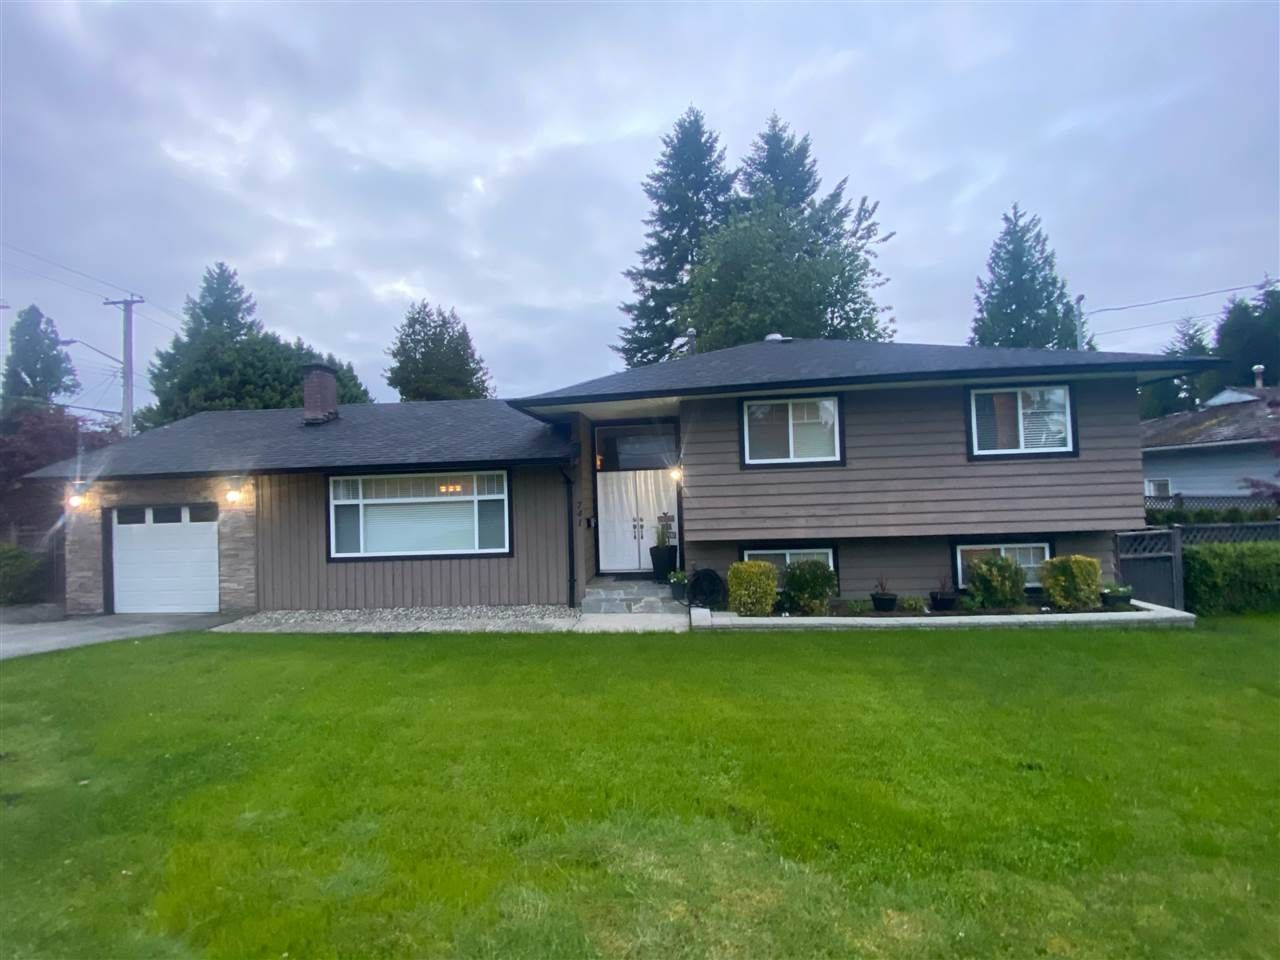 Main Photo: 741 EGMONT Avenue in Coquitlam: Coquitlam West House for sale : MLS®# R2533995